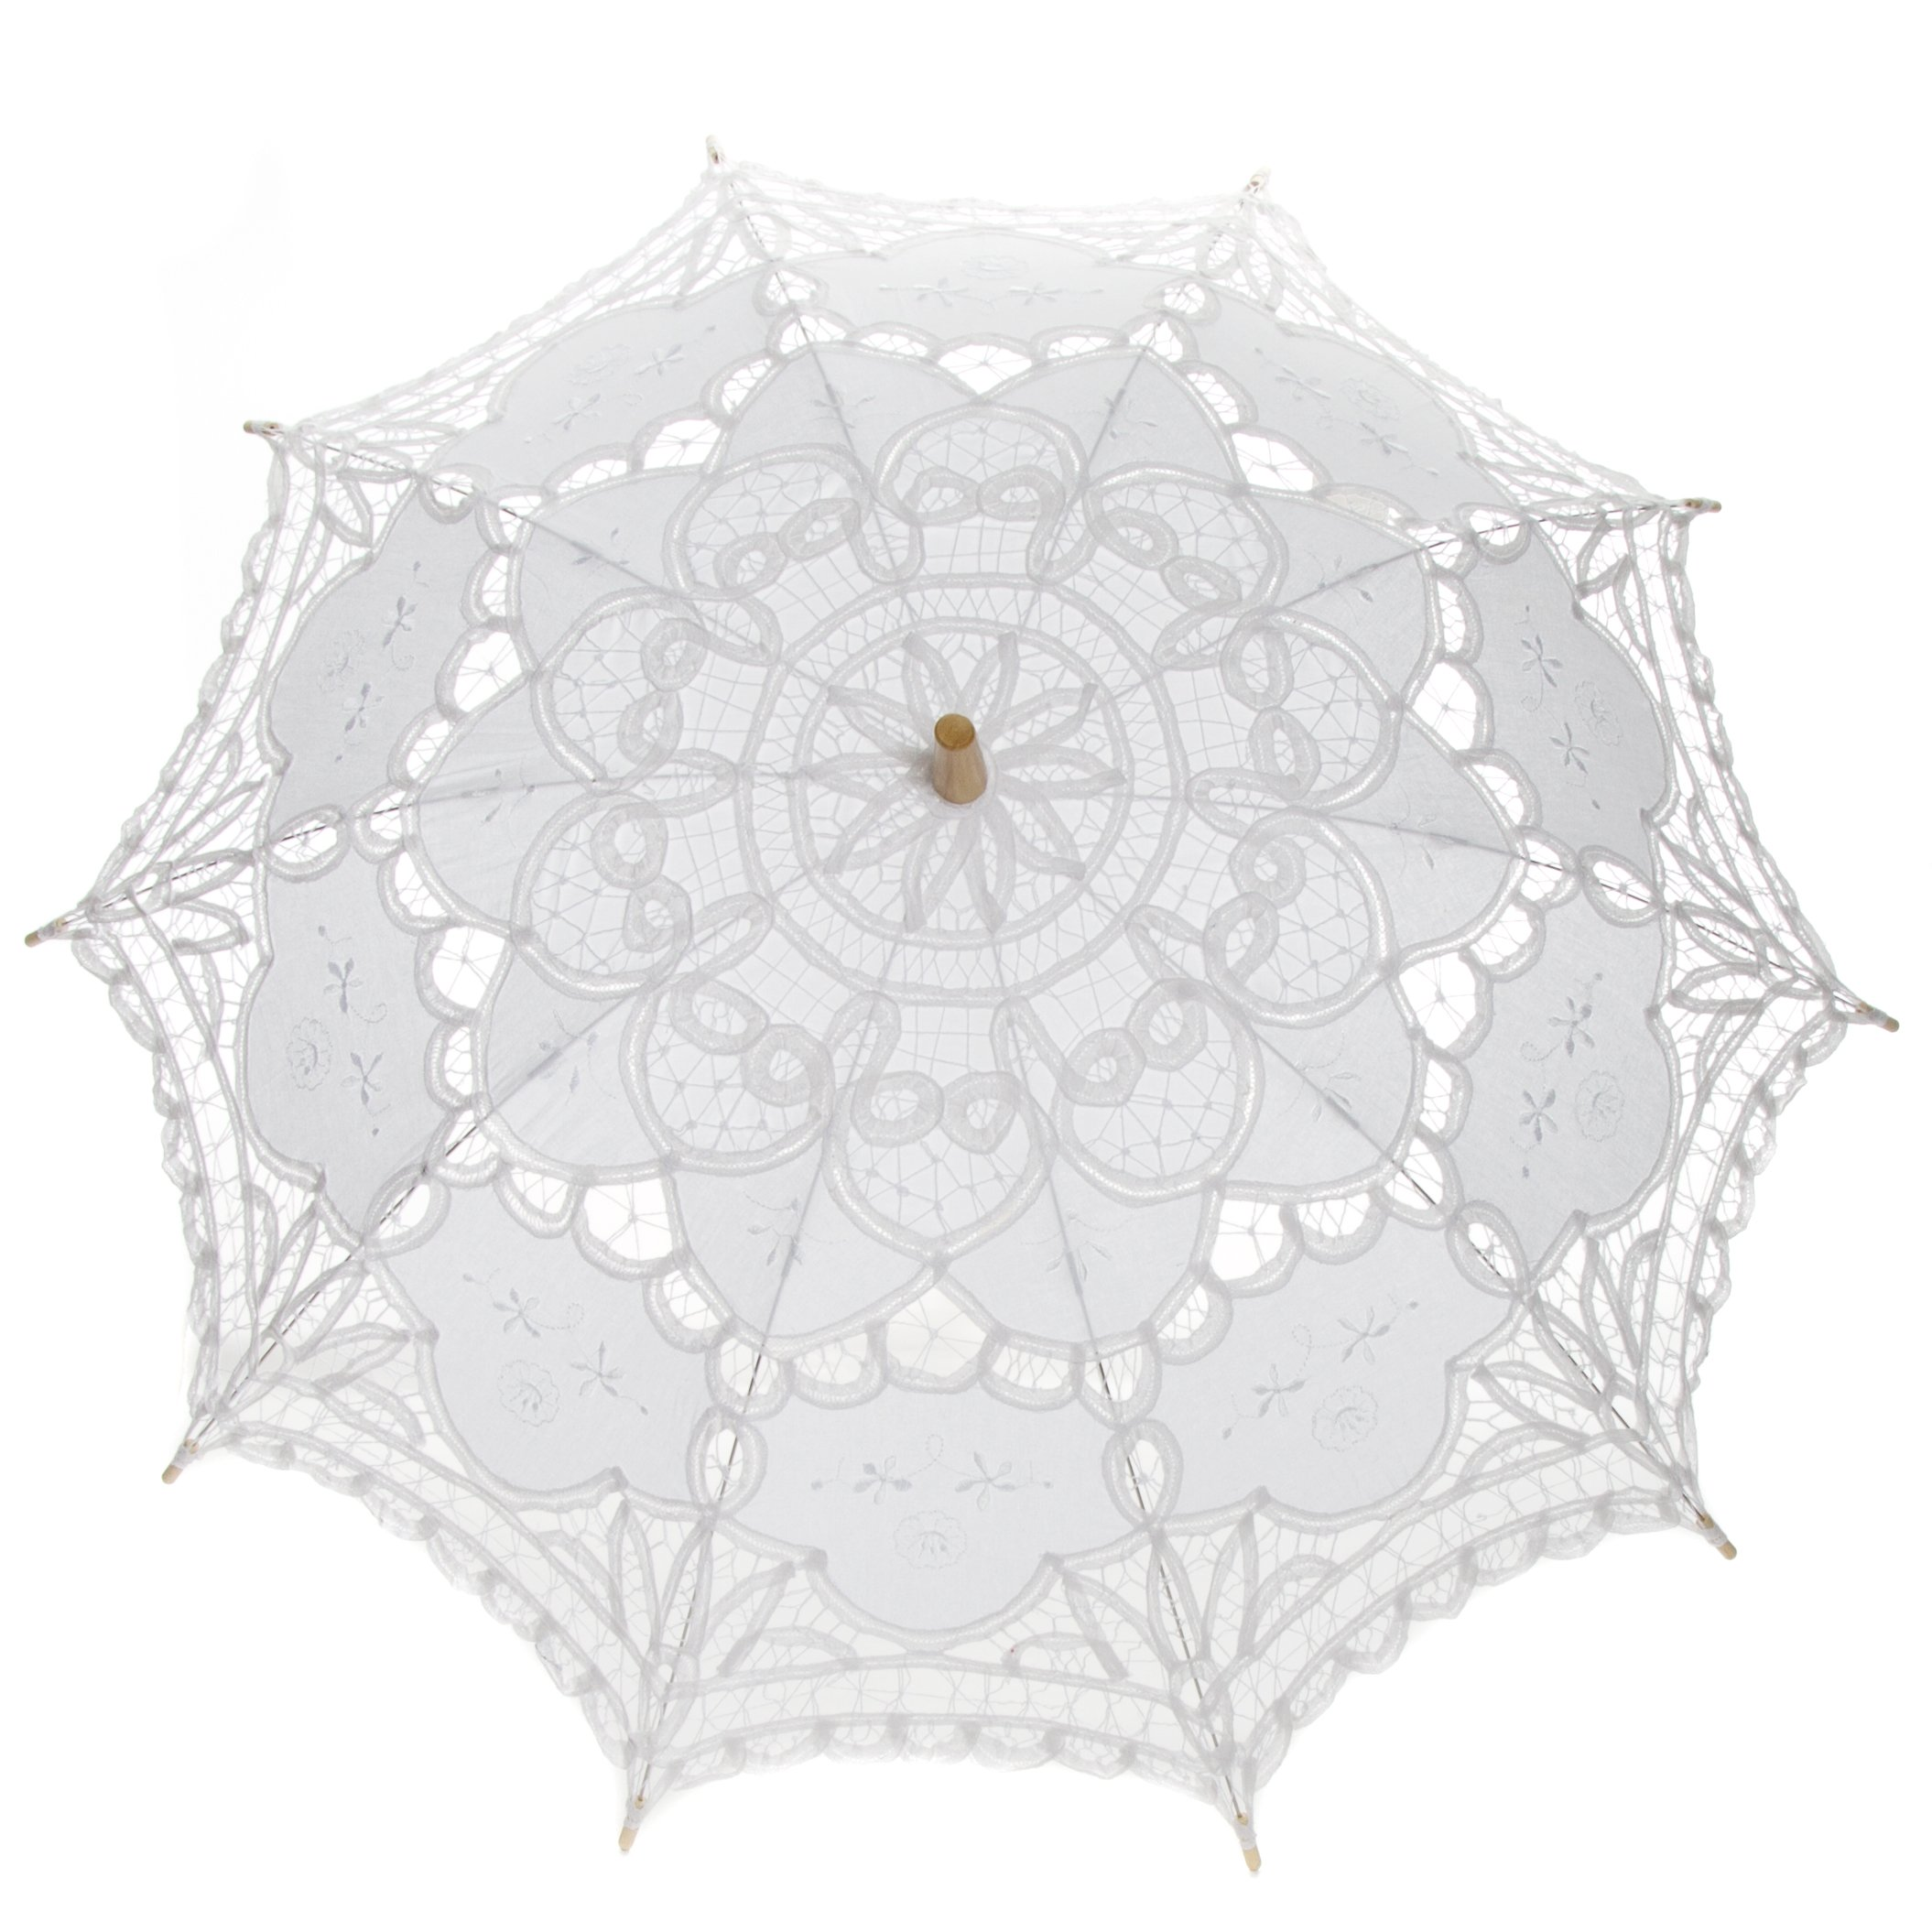 Leisureland Vintage Victorian Lace Parasol Umbrella White by Leisureland (Image #2)